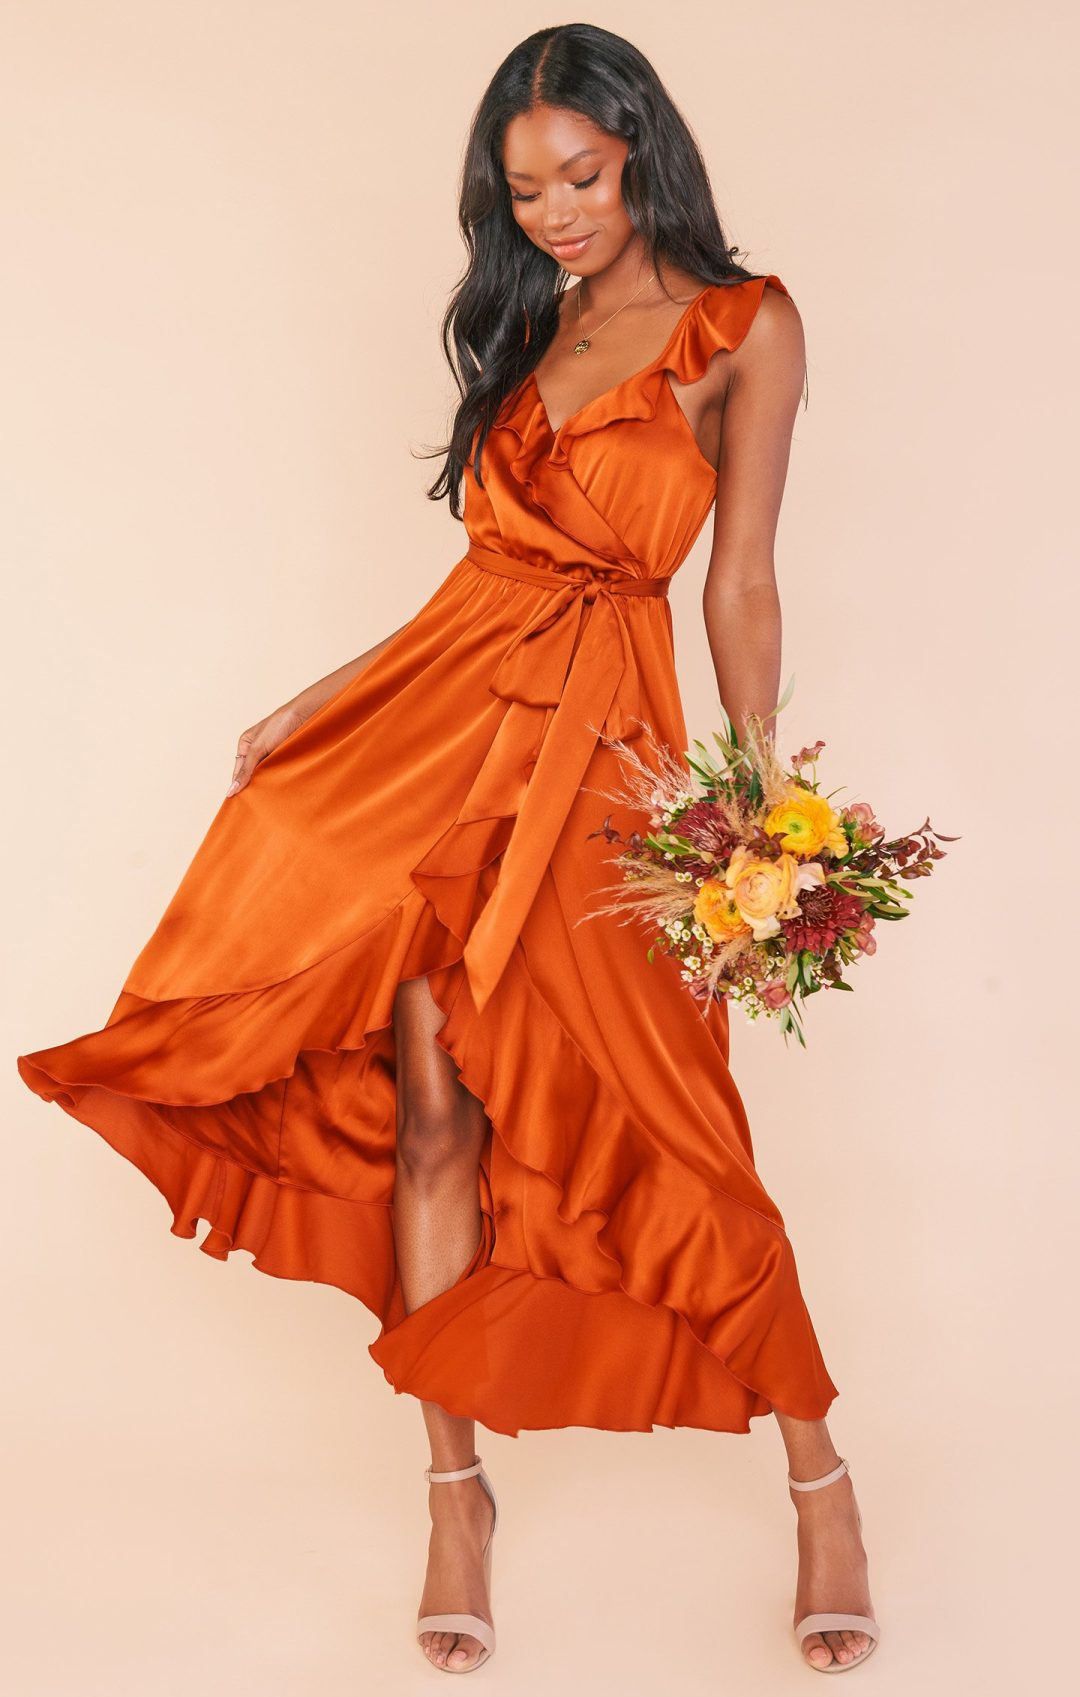 Orange bridesmaid dress with ruffles